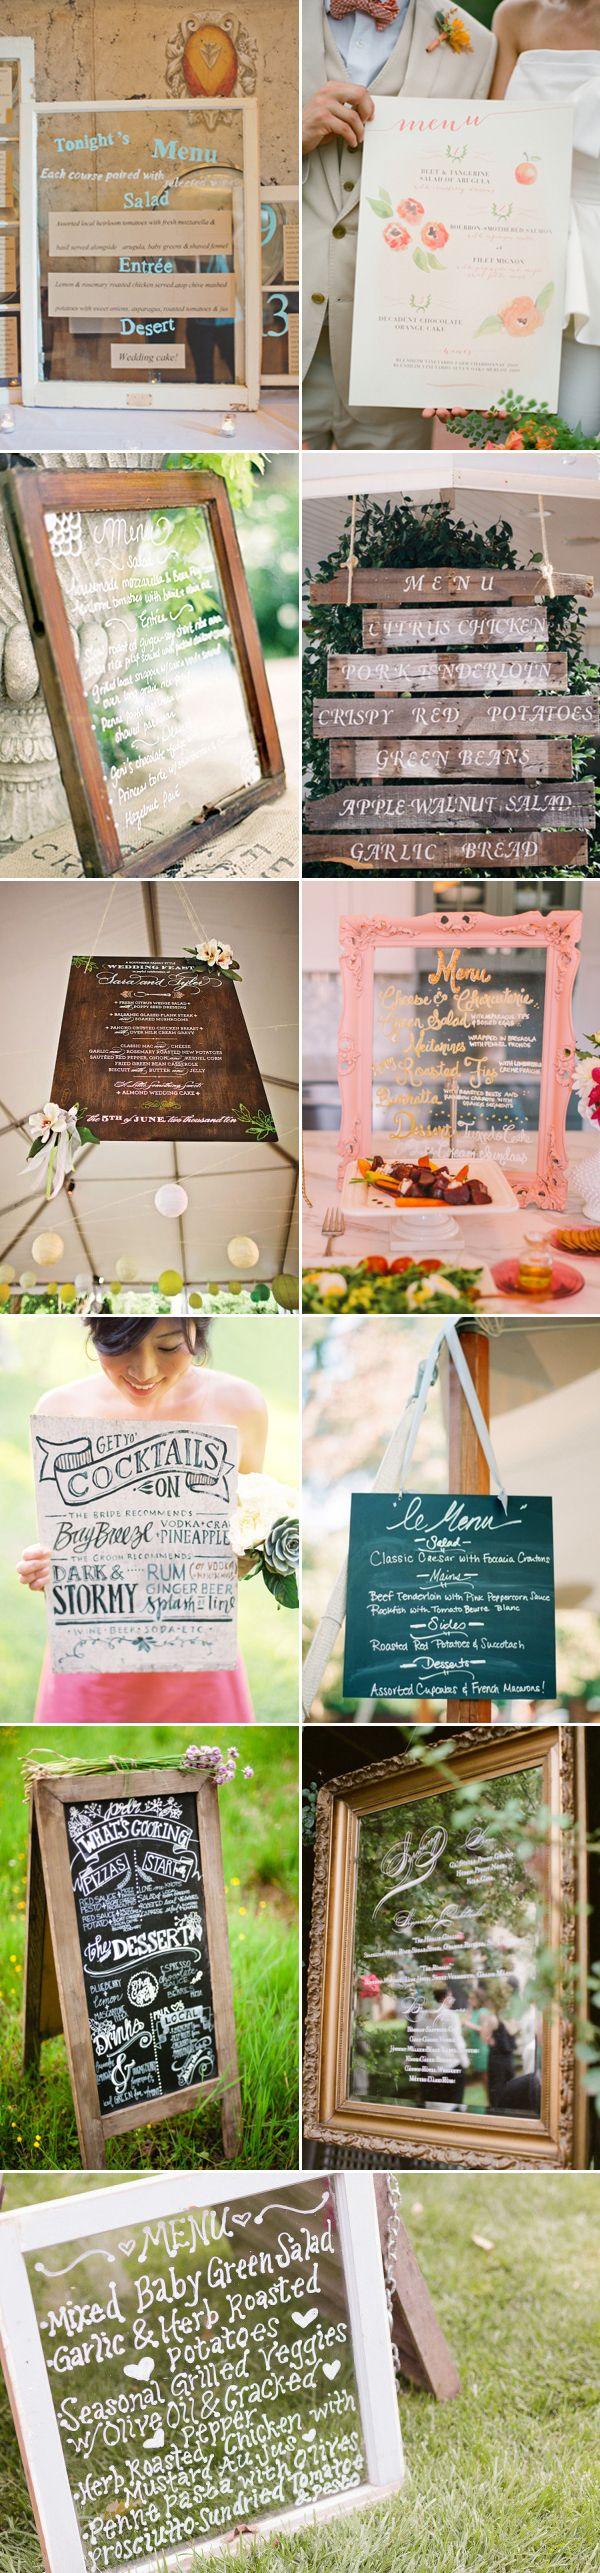 30 Creative Wedding Menu Ideas - boards and displays